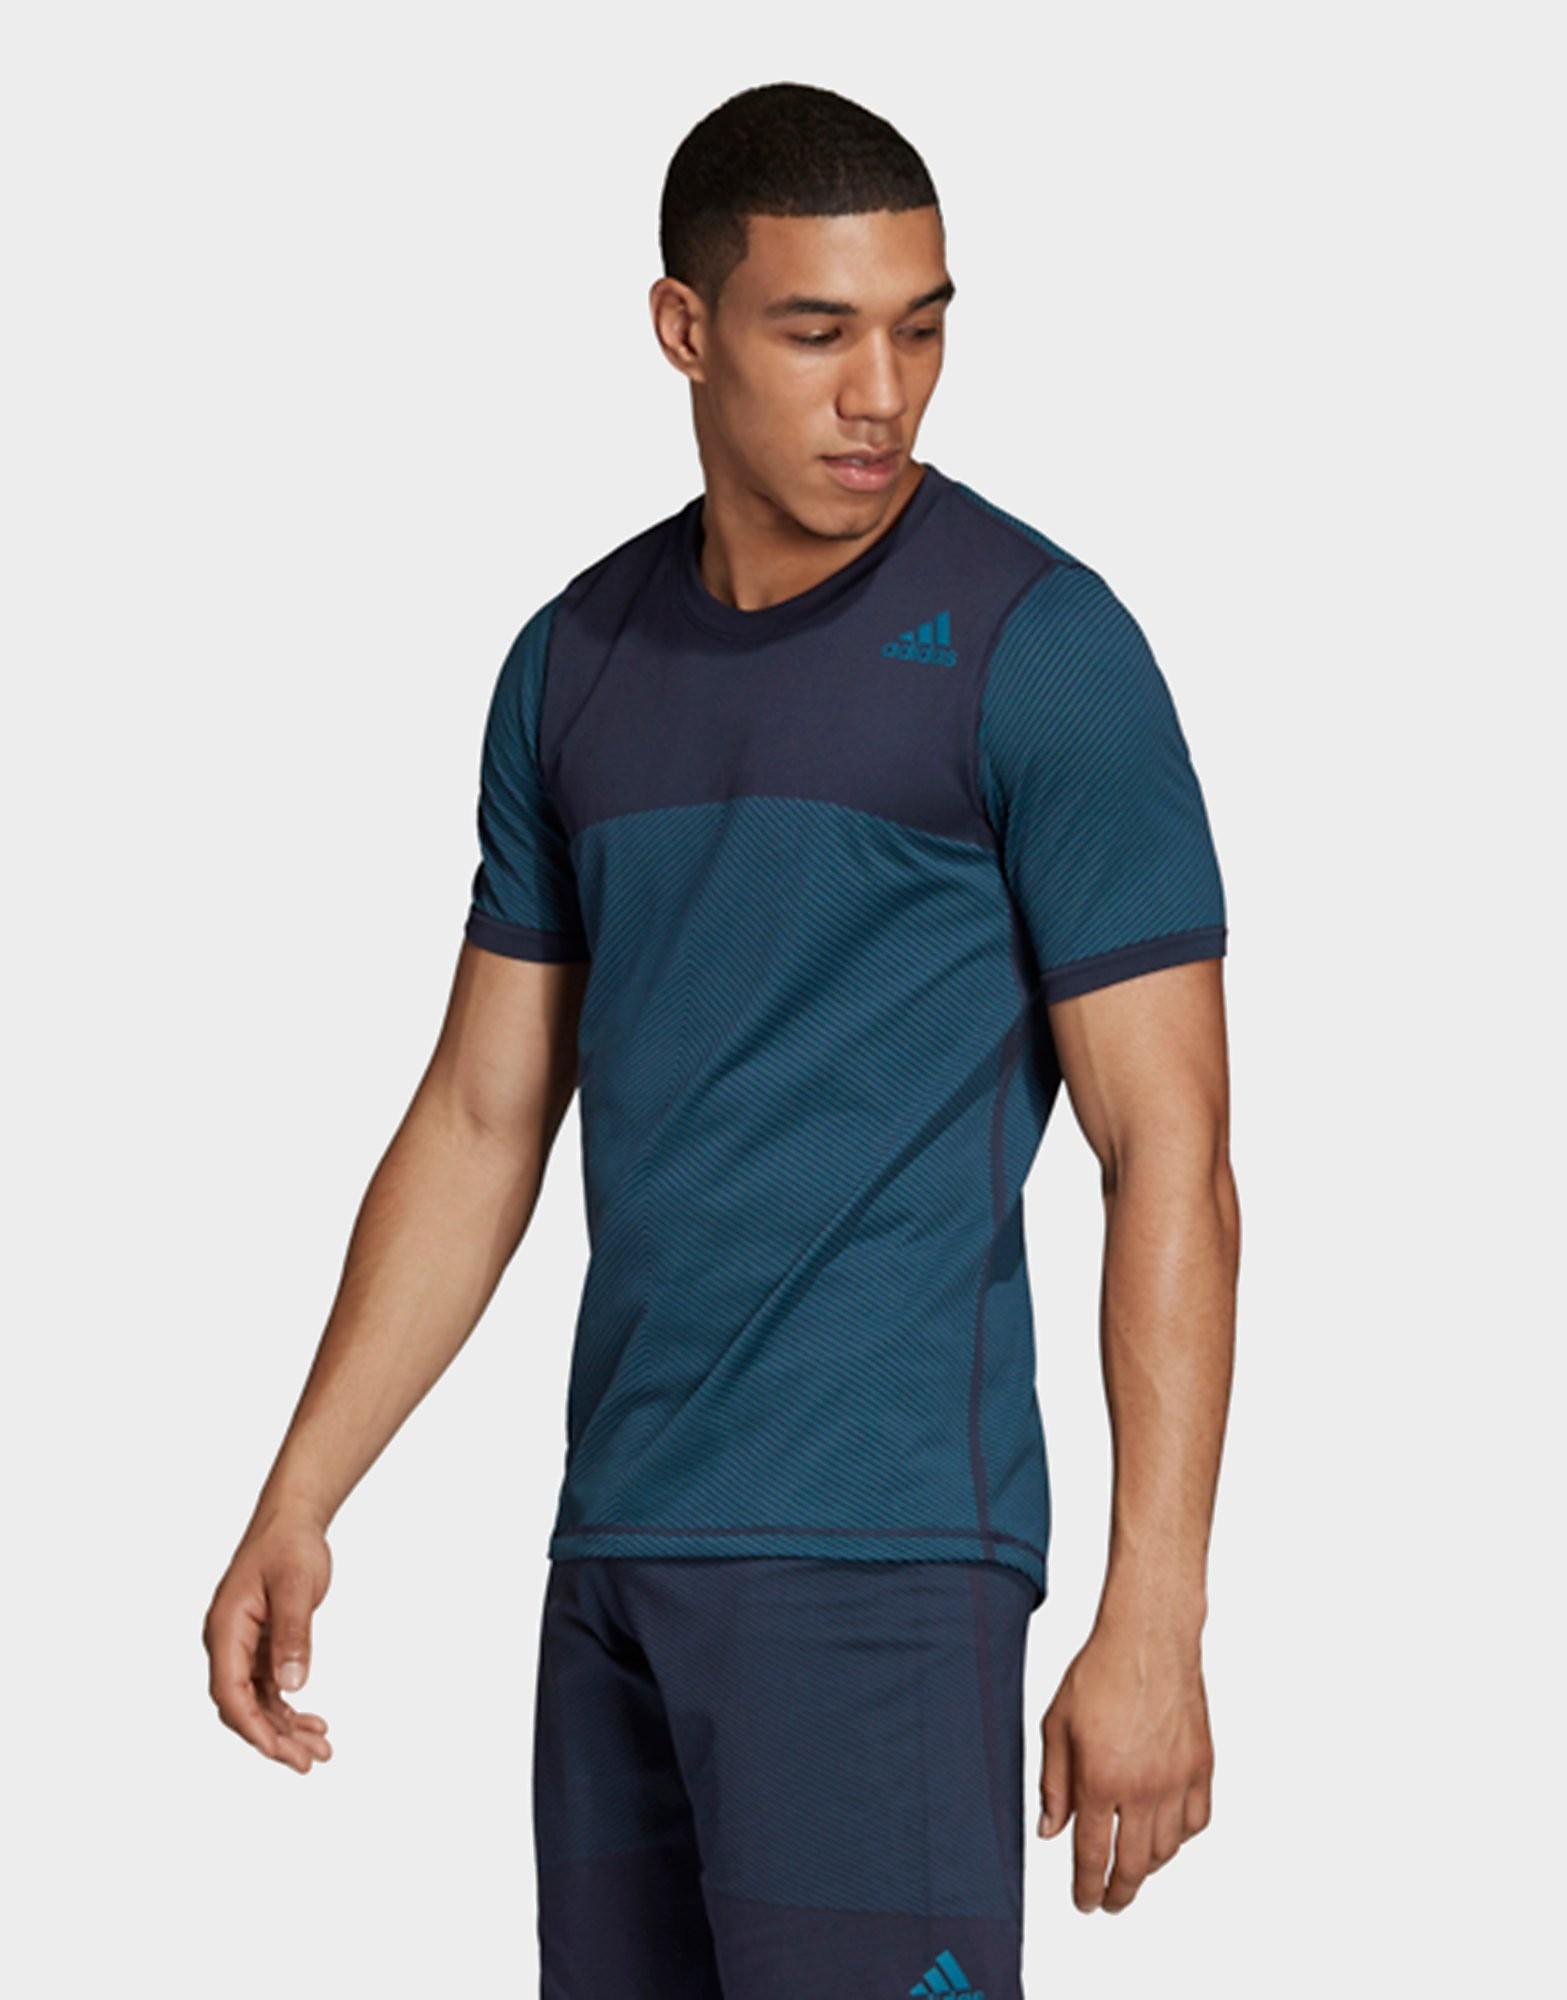 Adidas camisetas & Vest hombres JD Sports